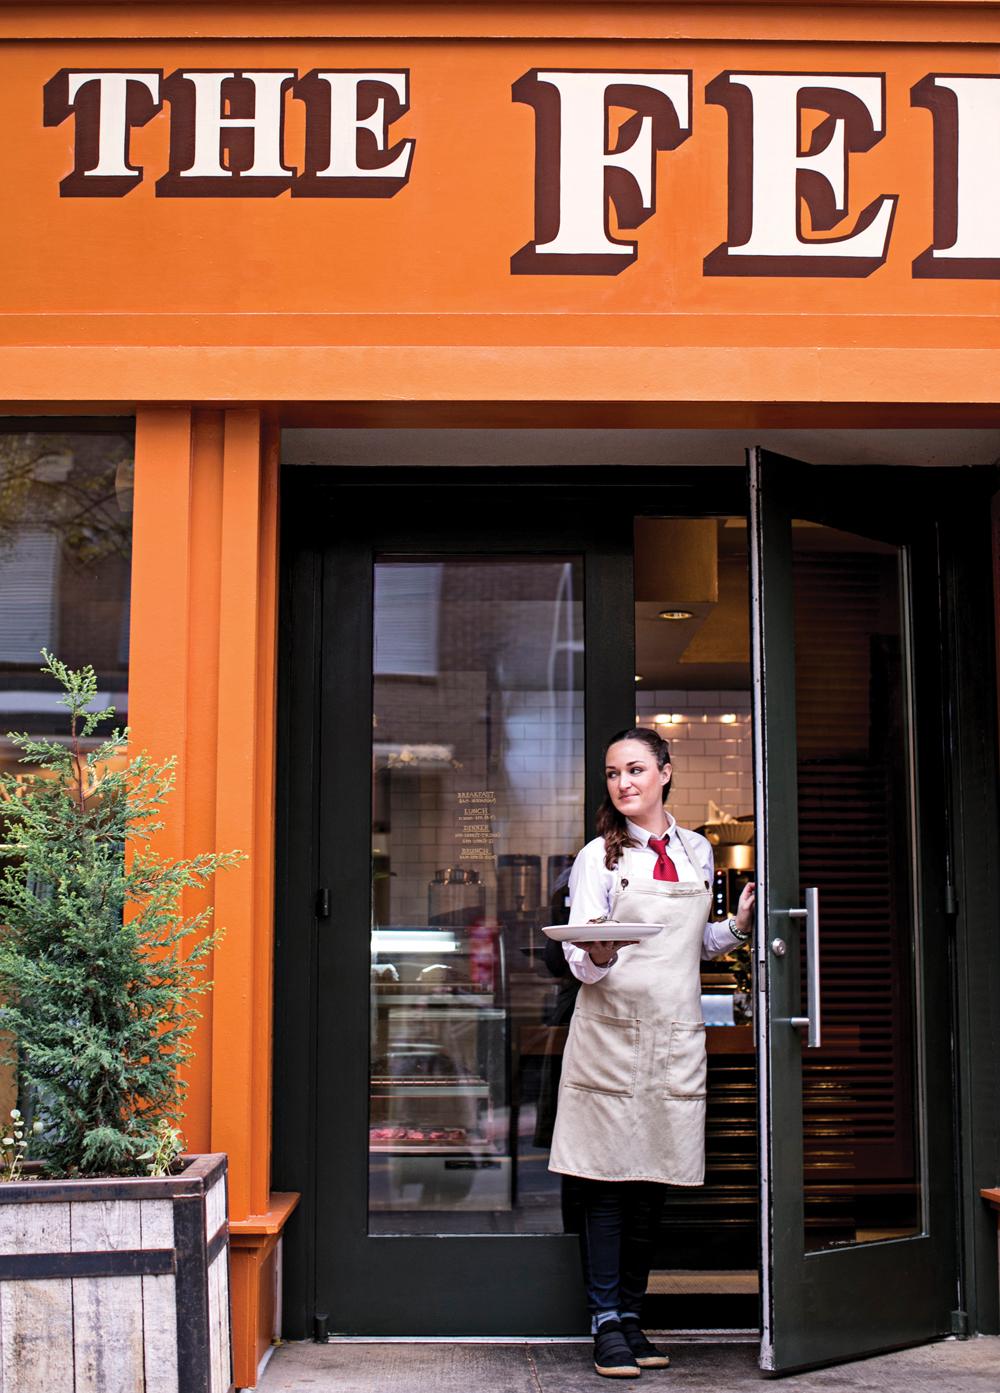 Best New Restaurants in Atlanta - The Federal